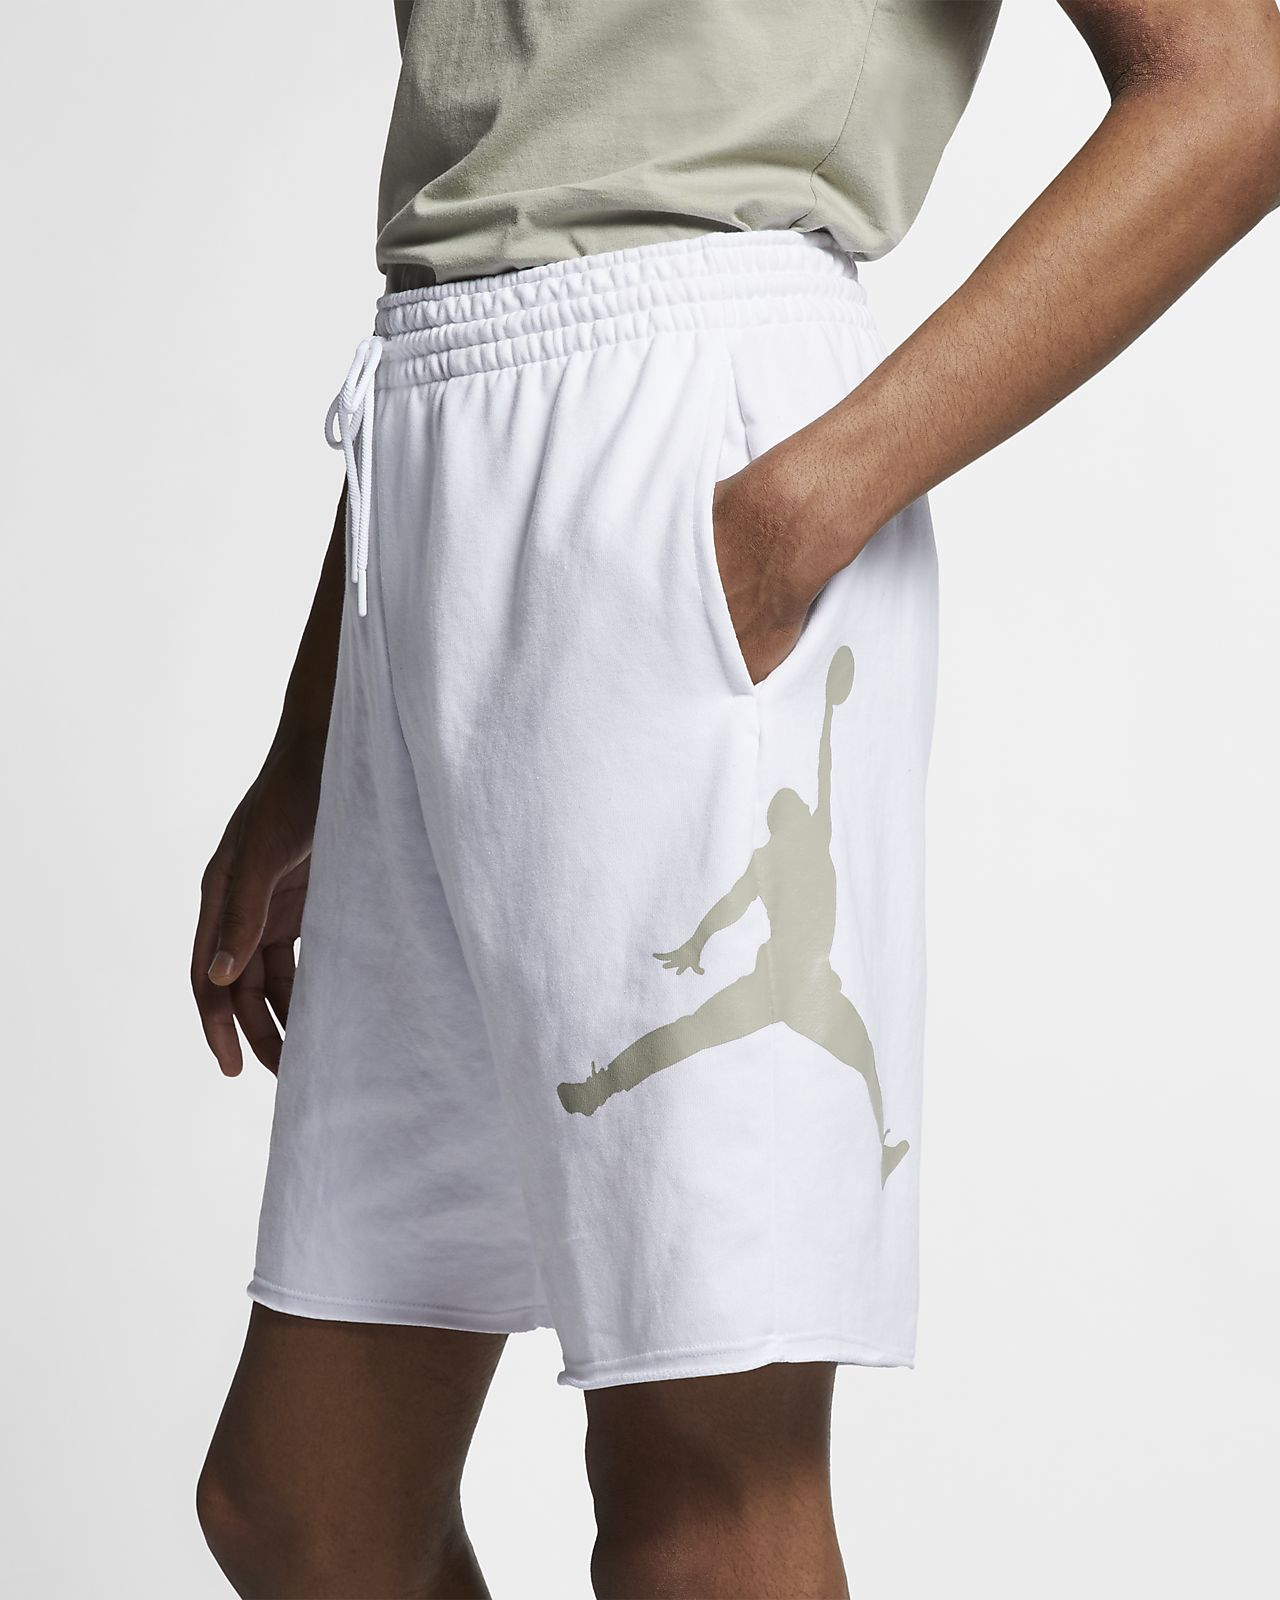 def680577ef Jordan Jumpman Logo Men's Fleece Shorts. Nike.com